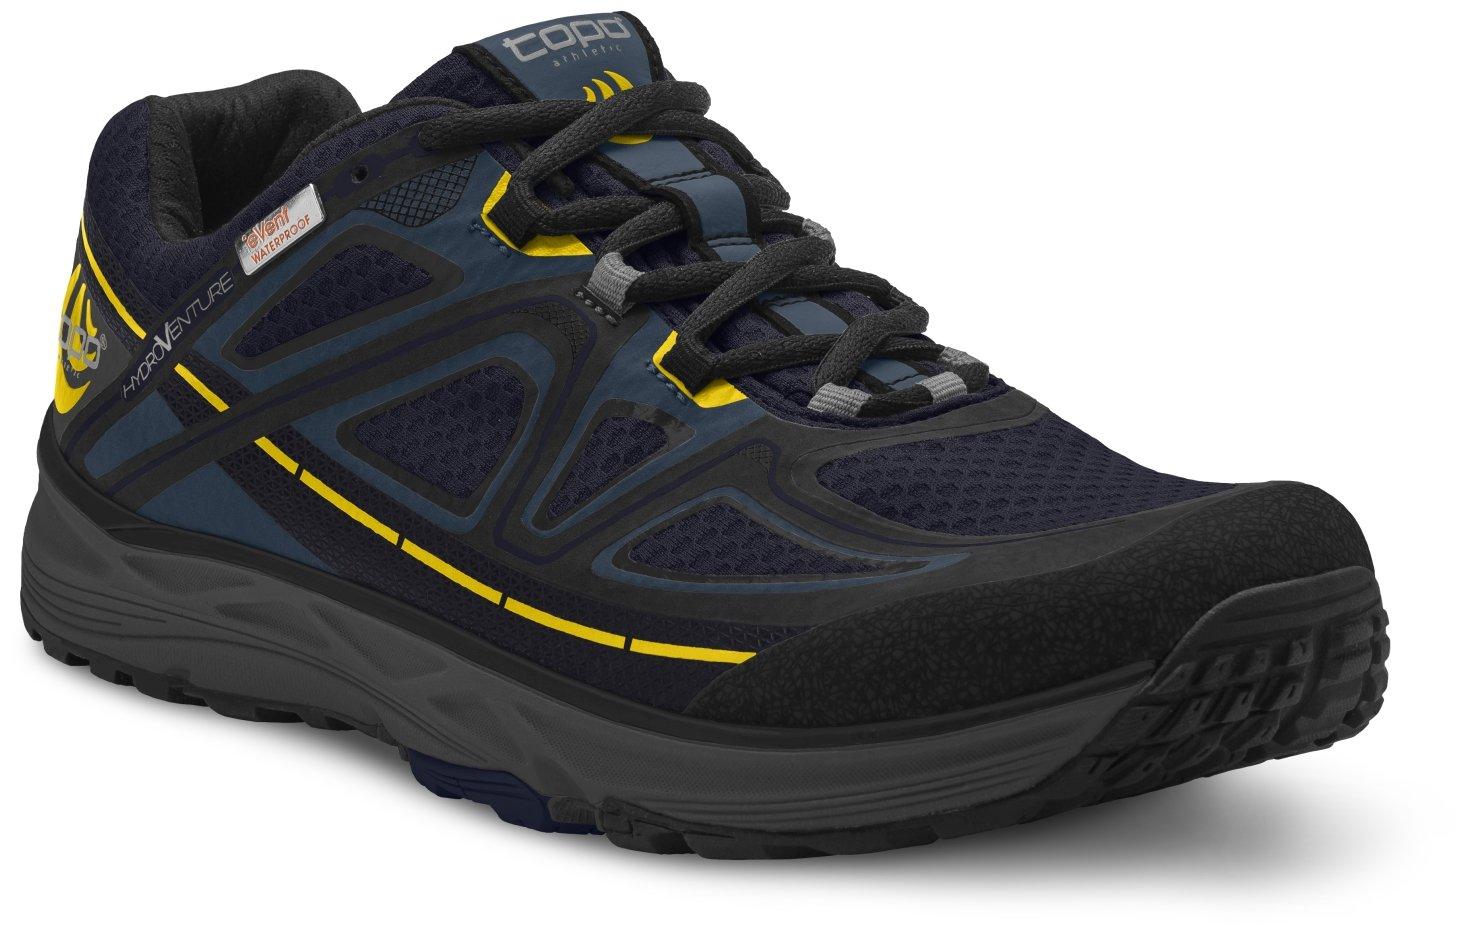 Topo Athletic Hydroventure Running Shoe - Men's B01C7F6RM0 11 D(M) US|Navy/Black